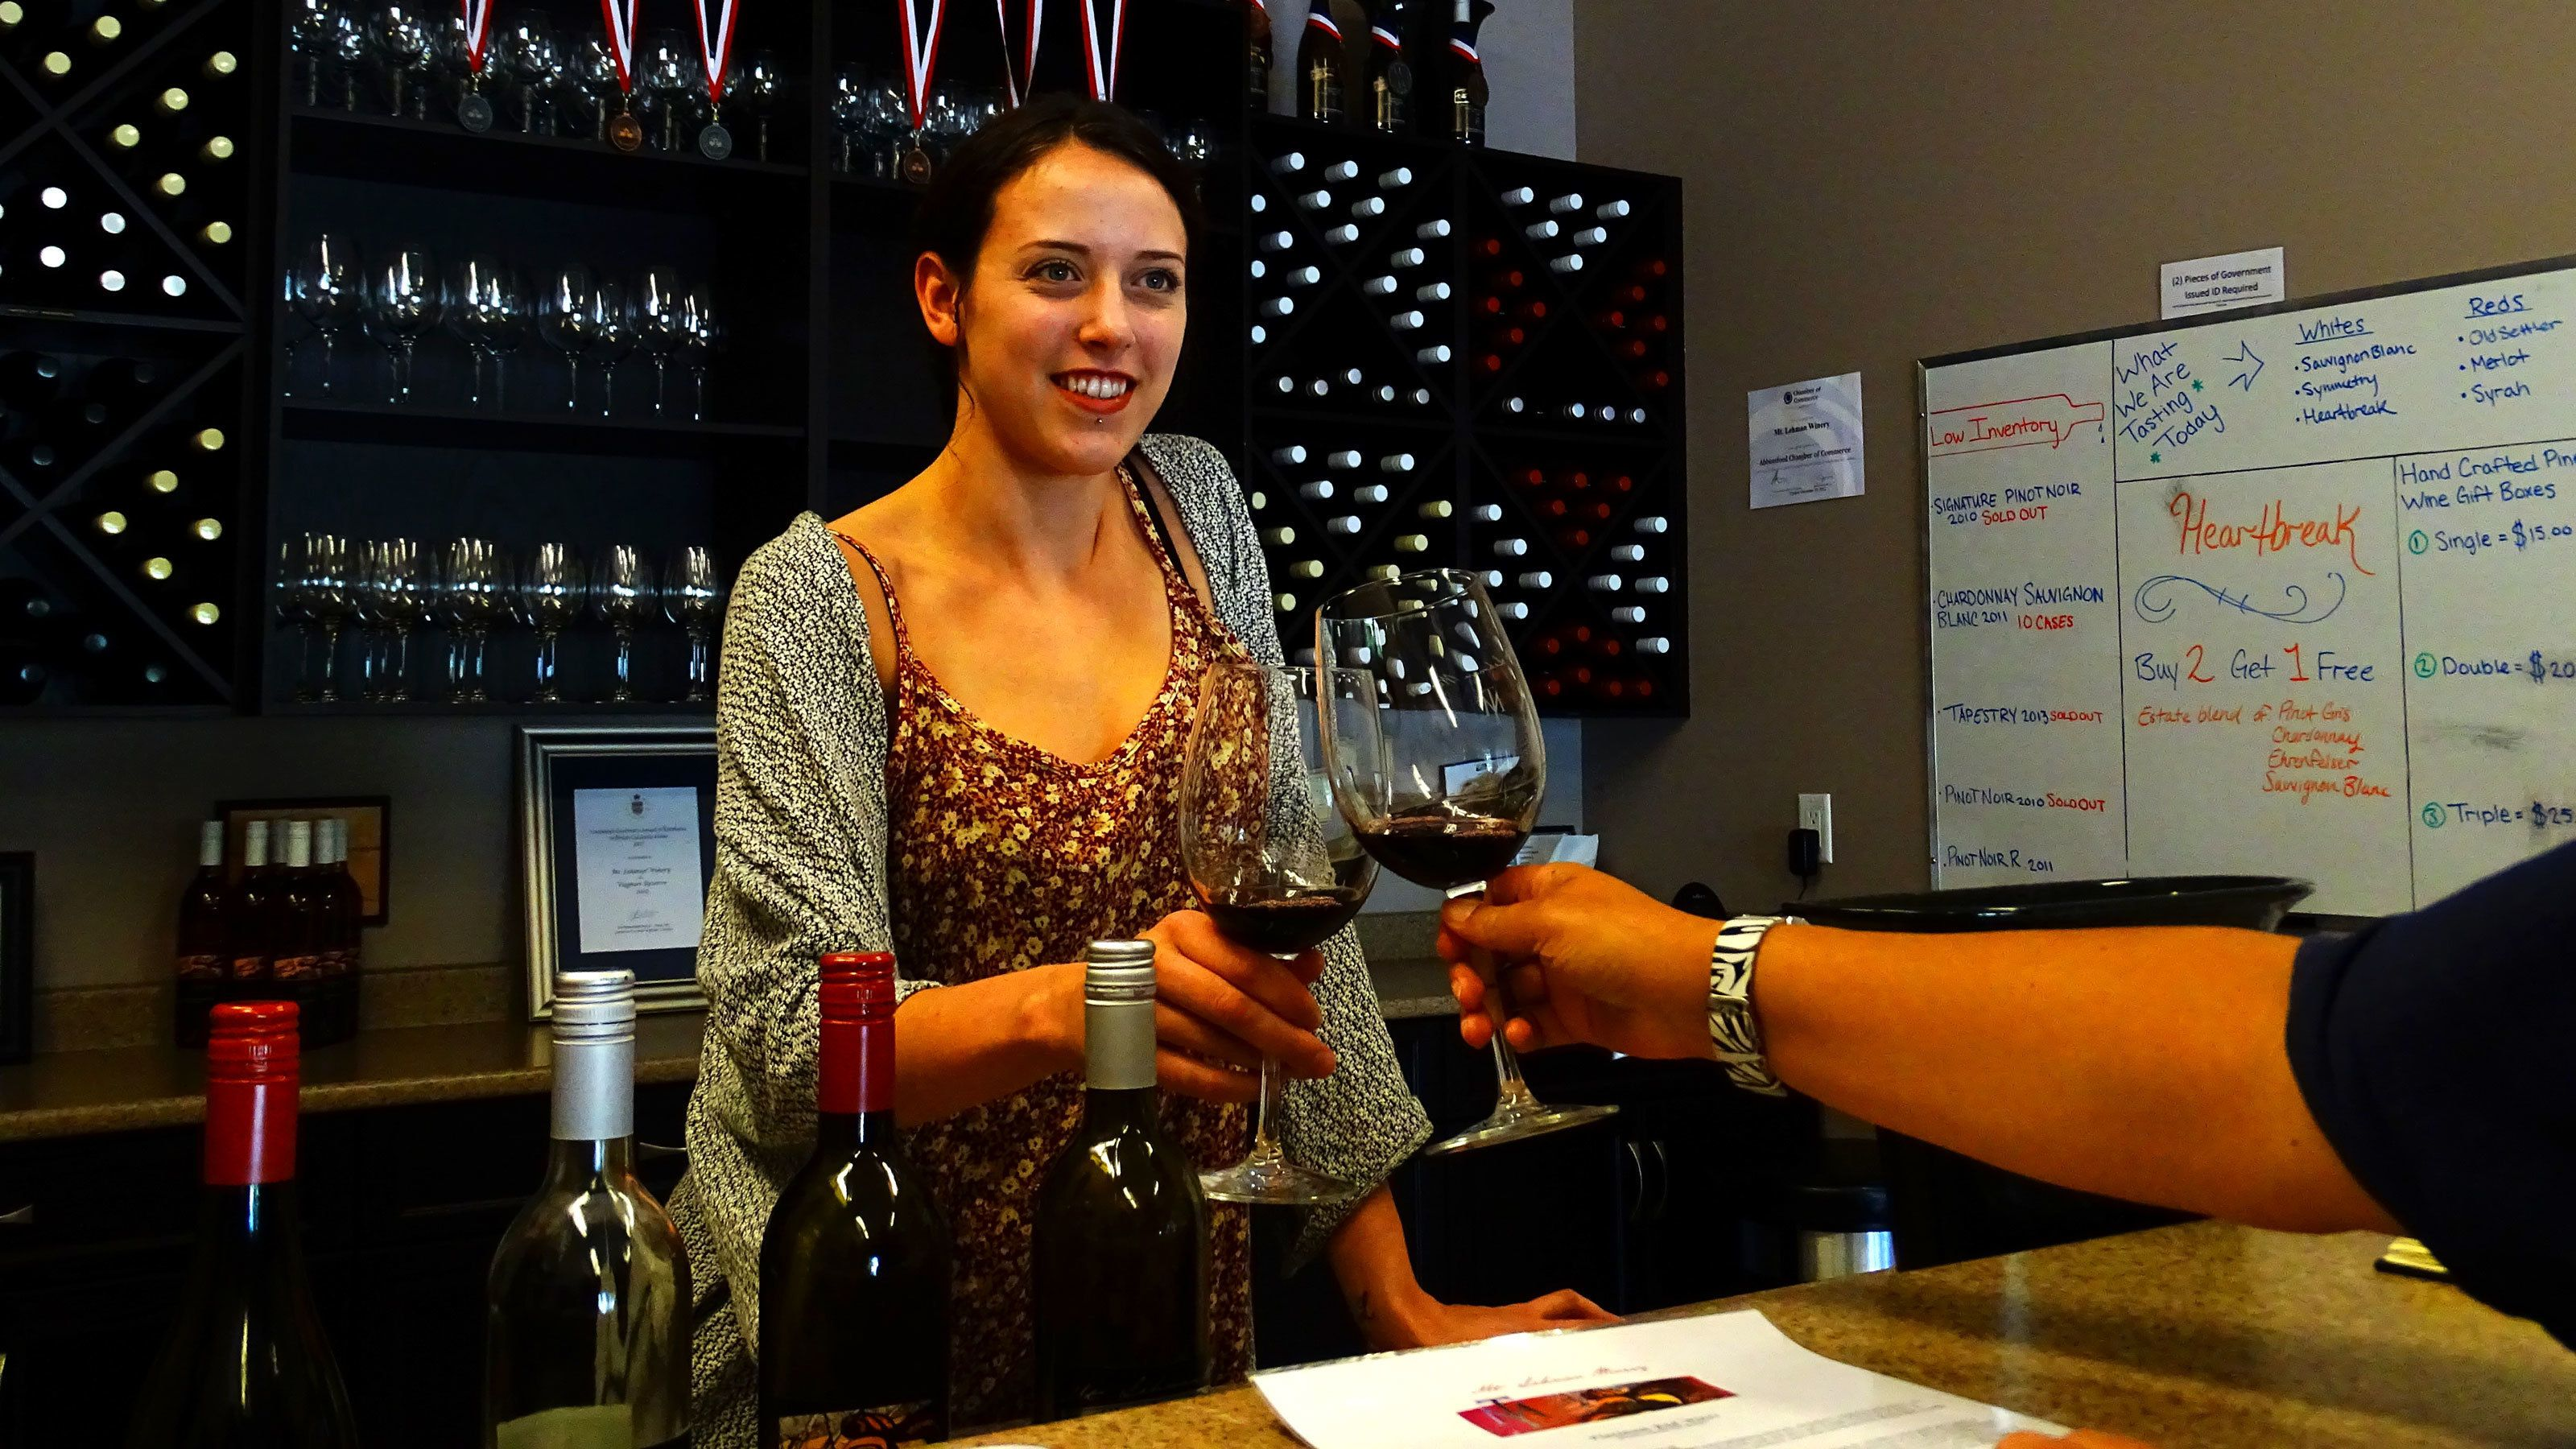 Private Half-Day Vancouver Wine Tasting Tour